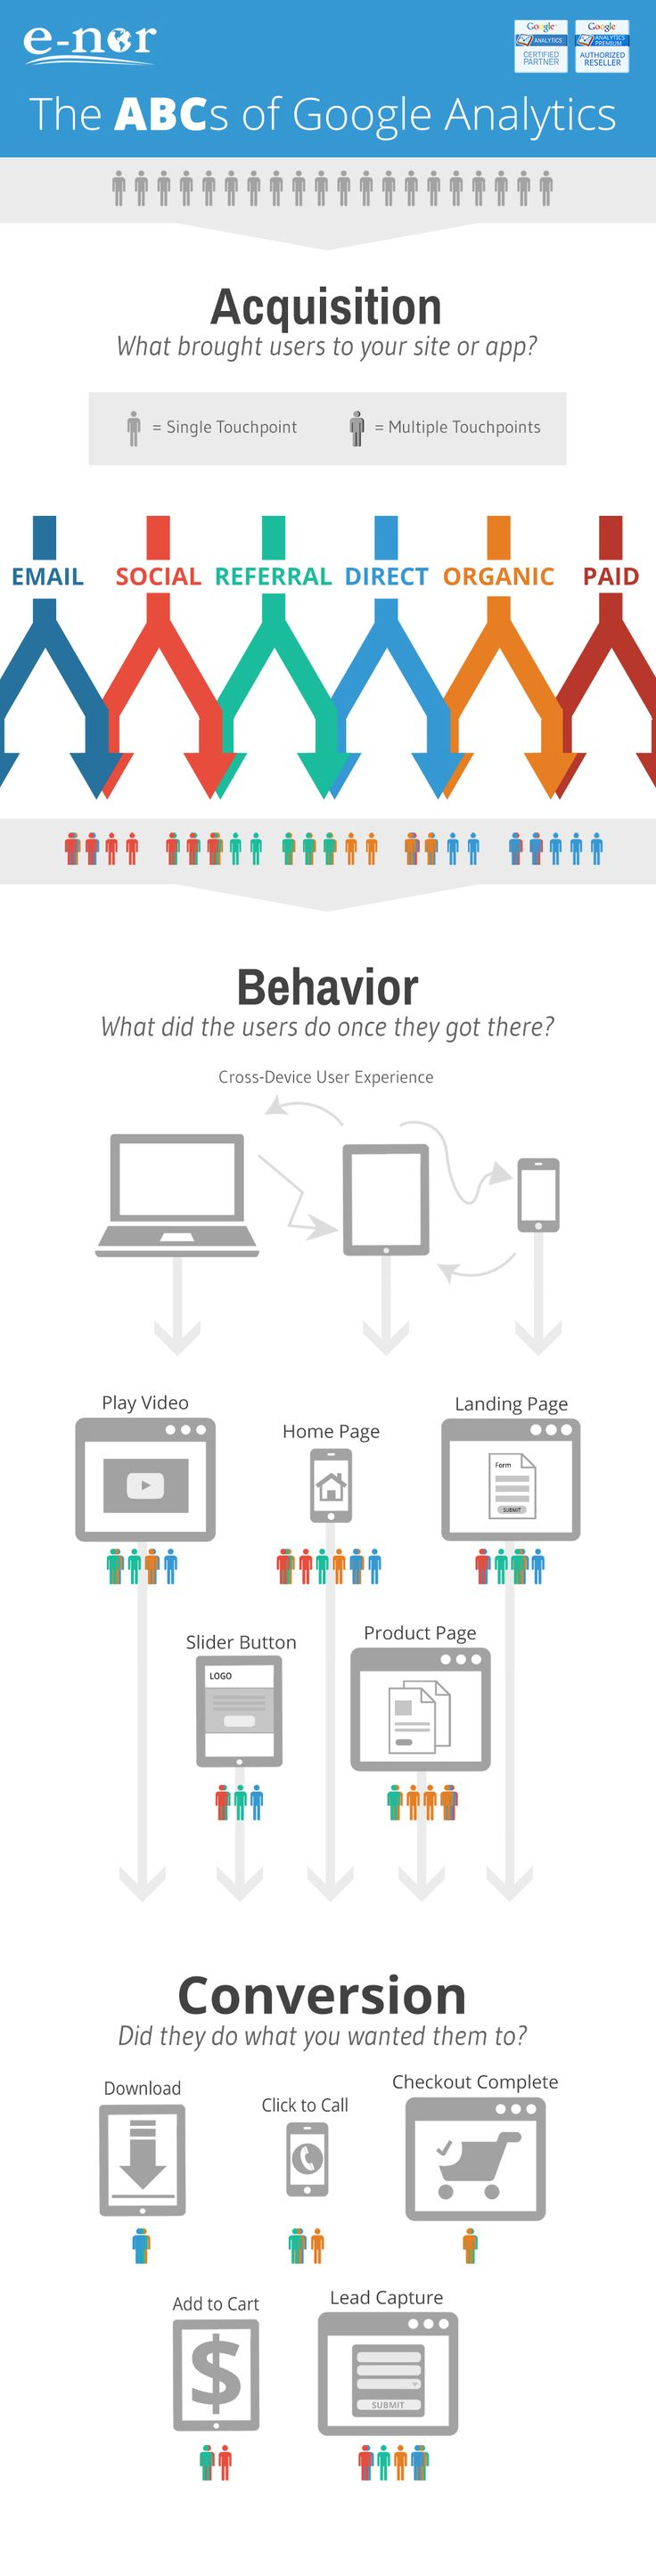 Advertising-Infographics-ABC's-of-Google-Analytics-«-E-Nor-Blog-–-Marketing-Optimization-and-Google Advertising Infographics : ABC's of Google Analytics « E-Nor Blog – Marketing Optimization and Google ...